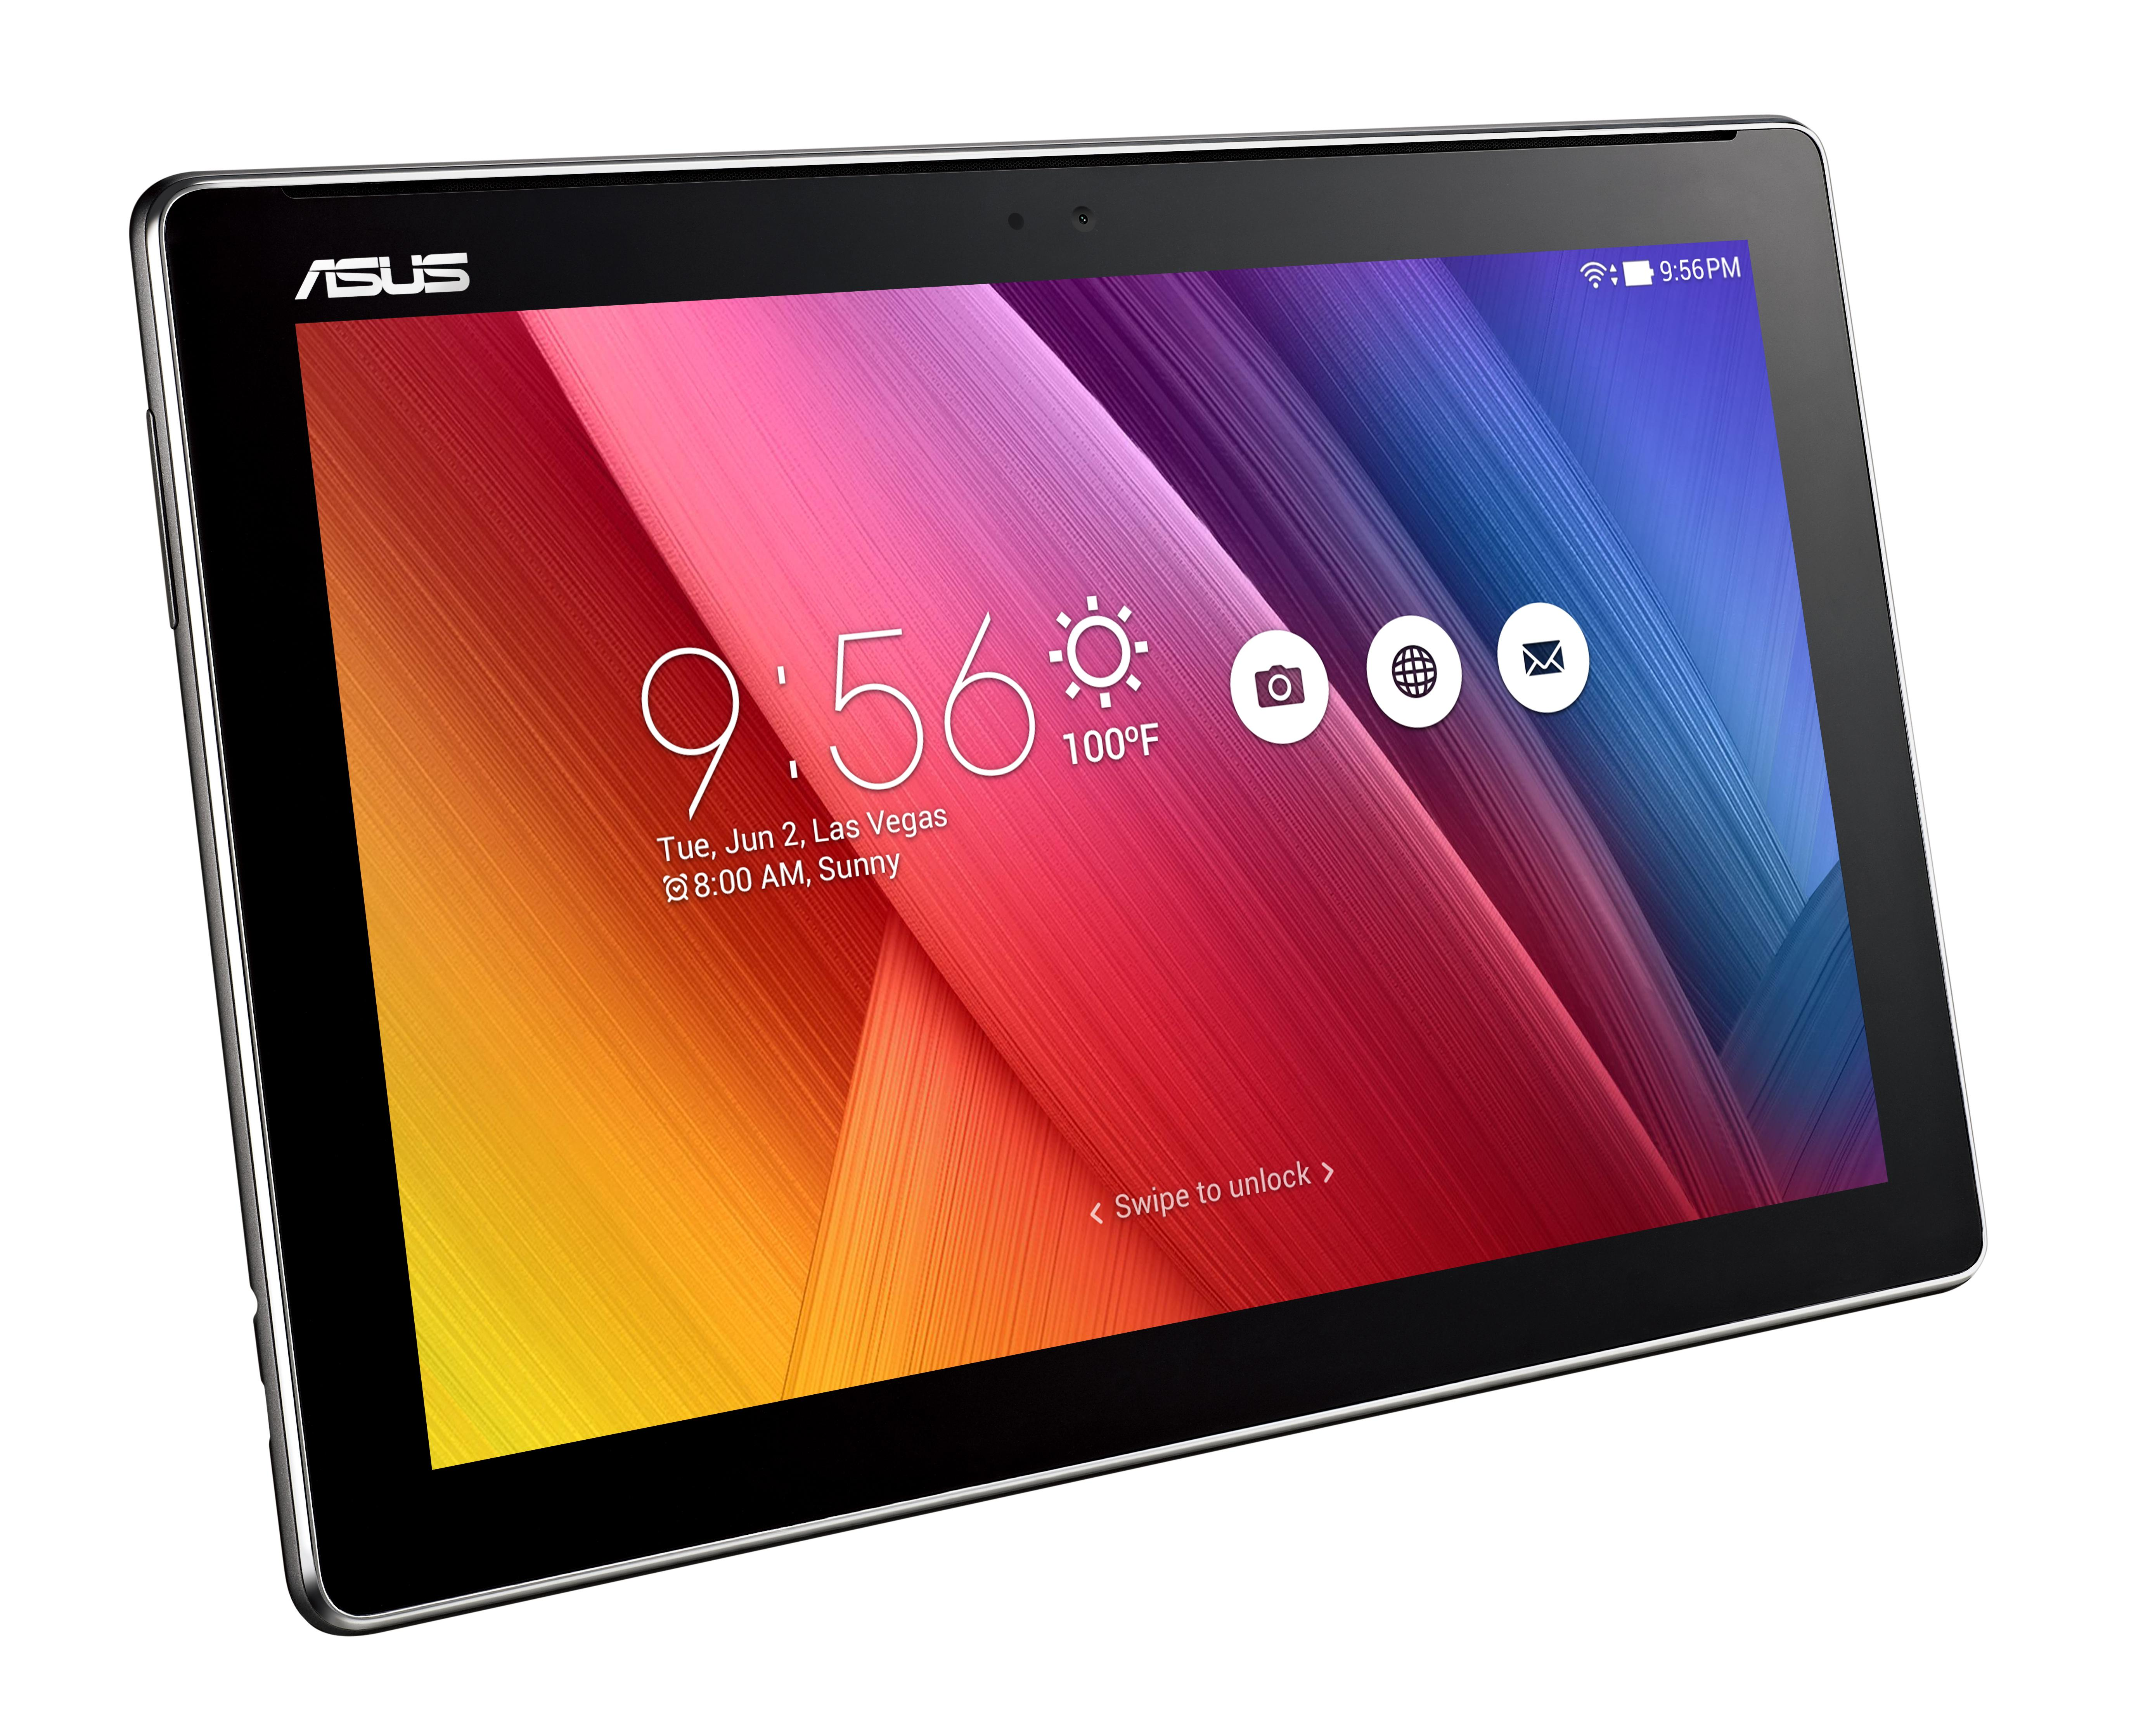 ASUS Zenpad 10.1/MTK8163/32G/2G/A M, černá